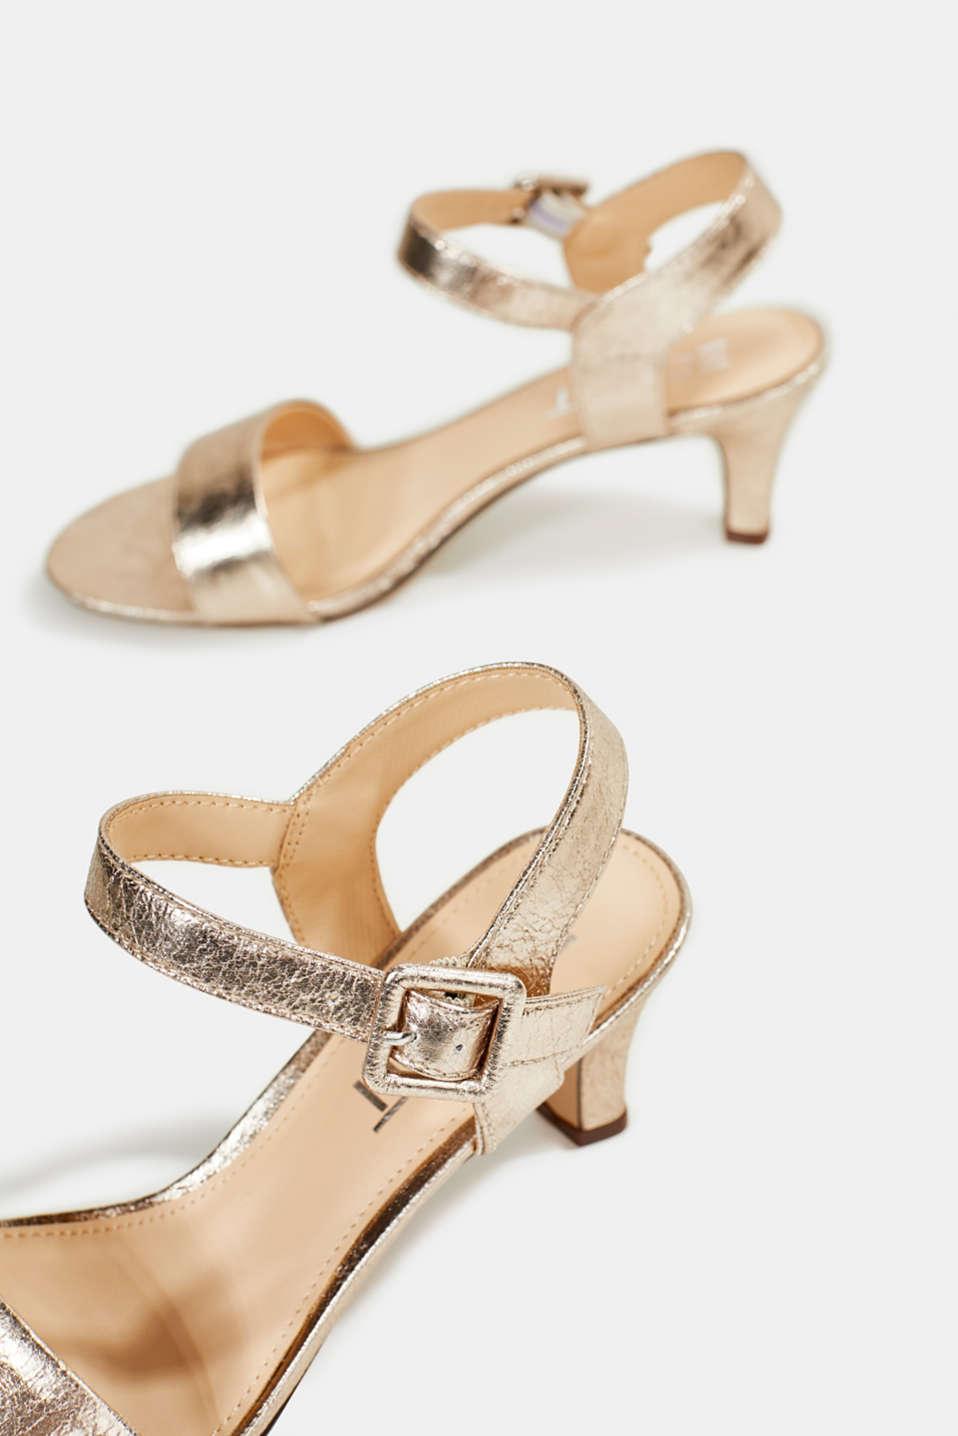 Sandals in a crushed metallic look, SKIN BEIGE, detail image number 6